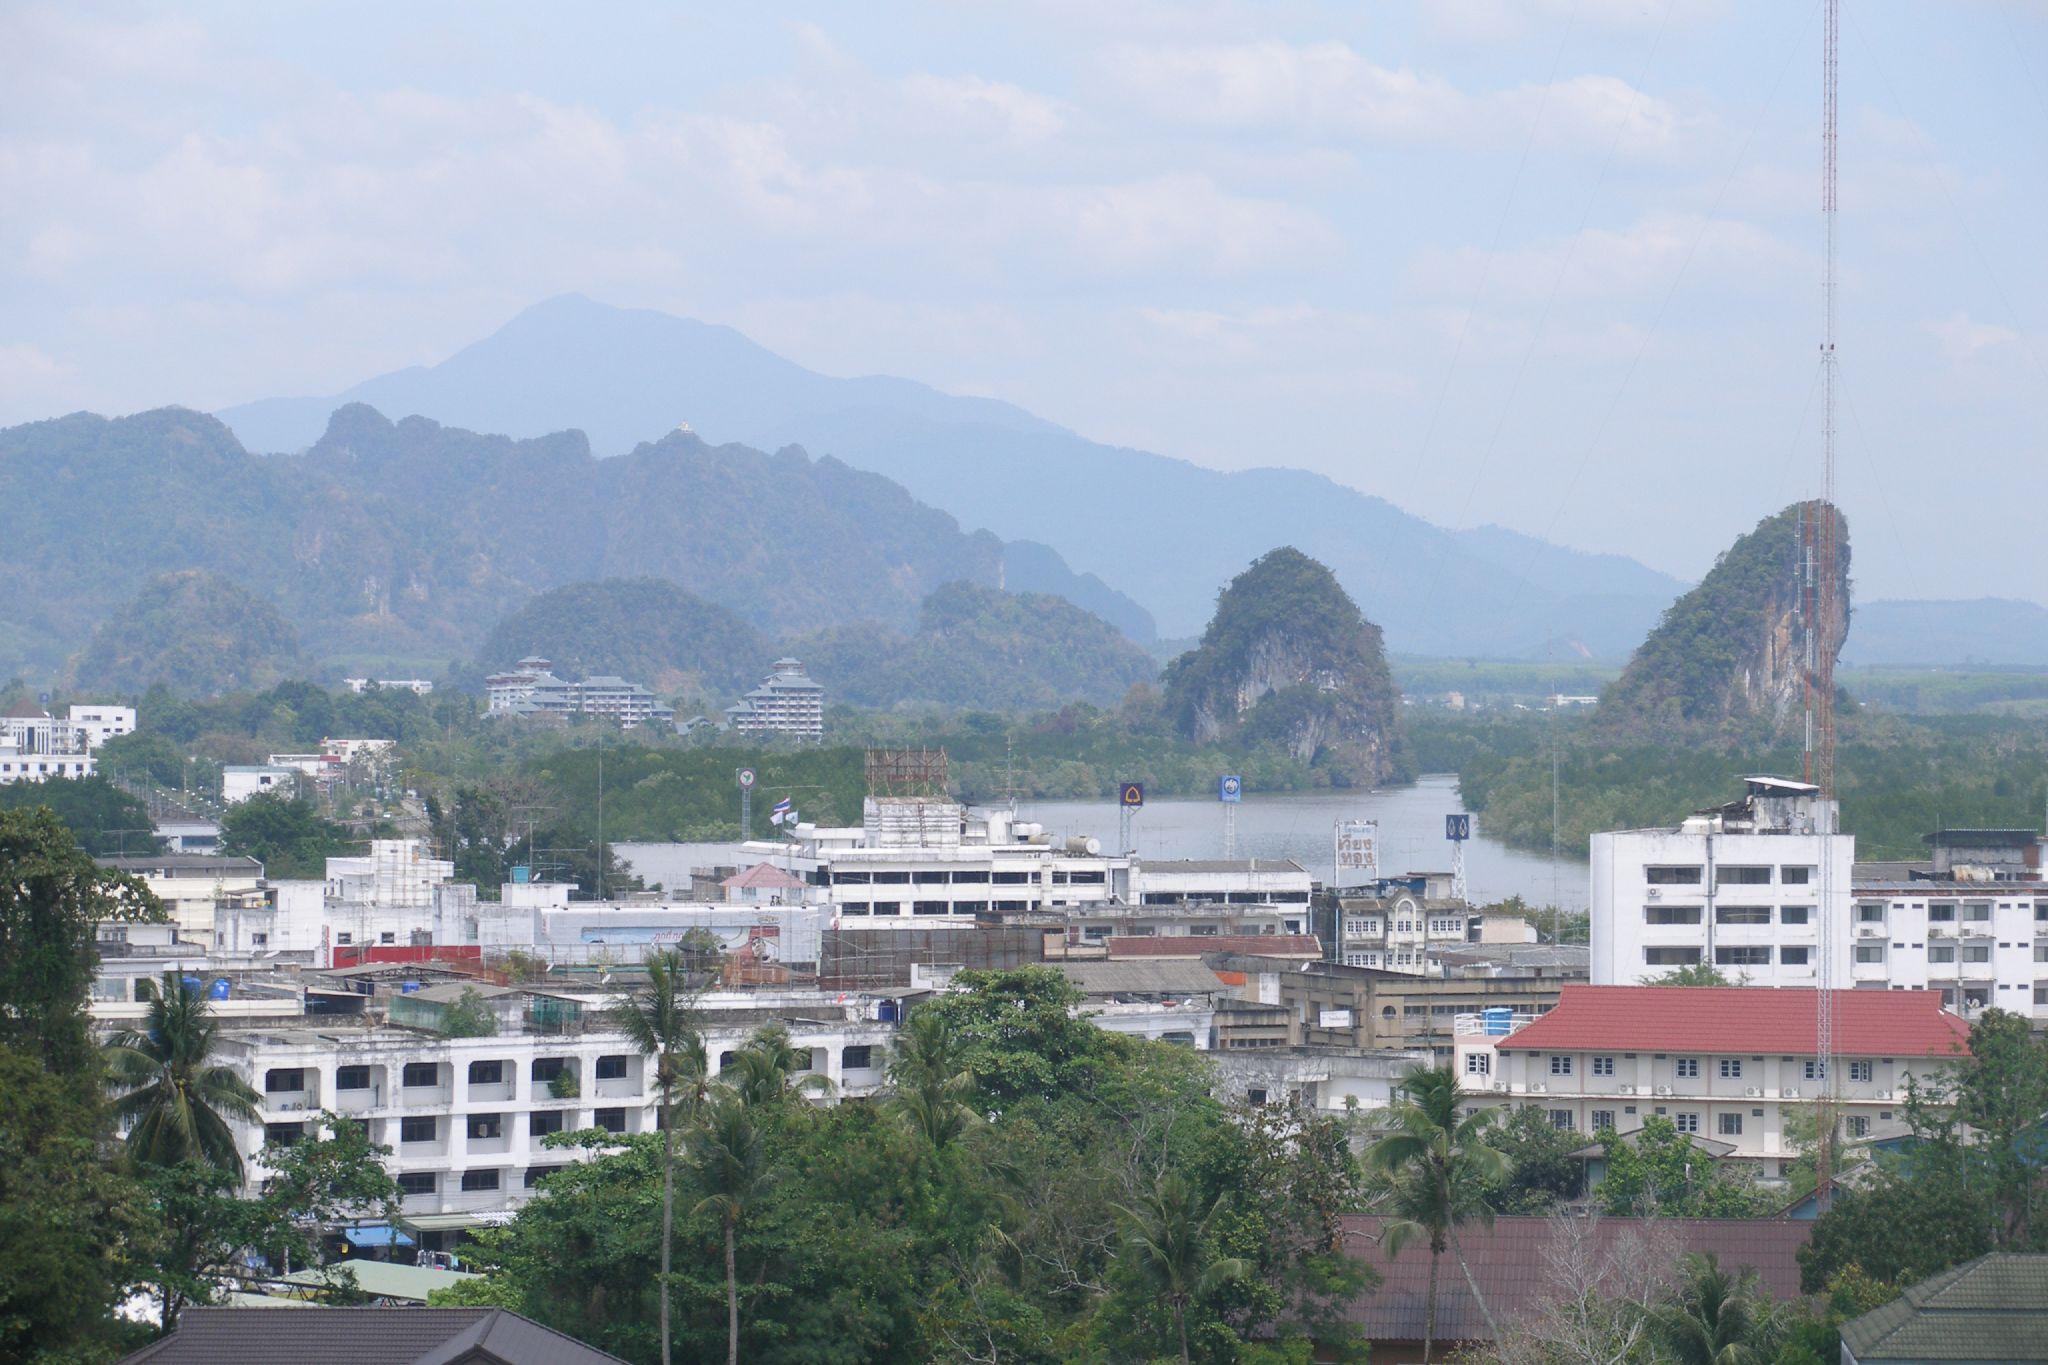 File:View over Krabi town.jpg - Wikimedia Commons